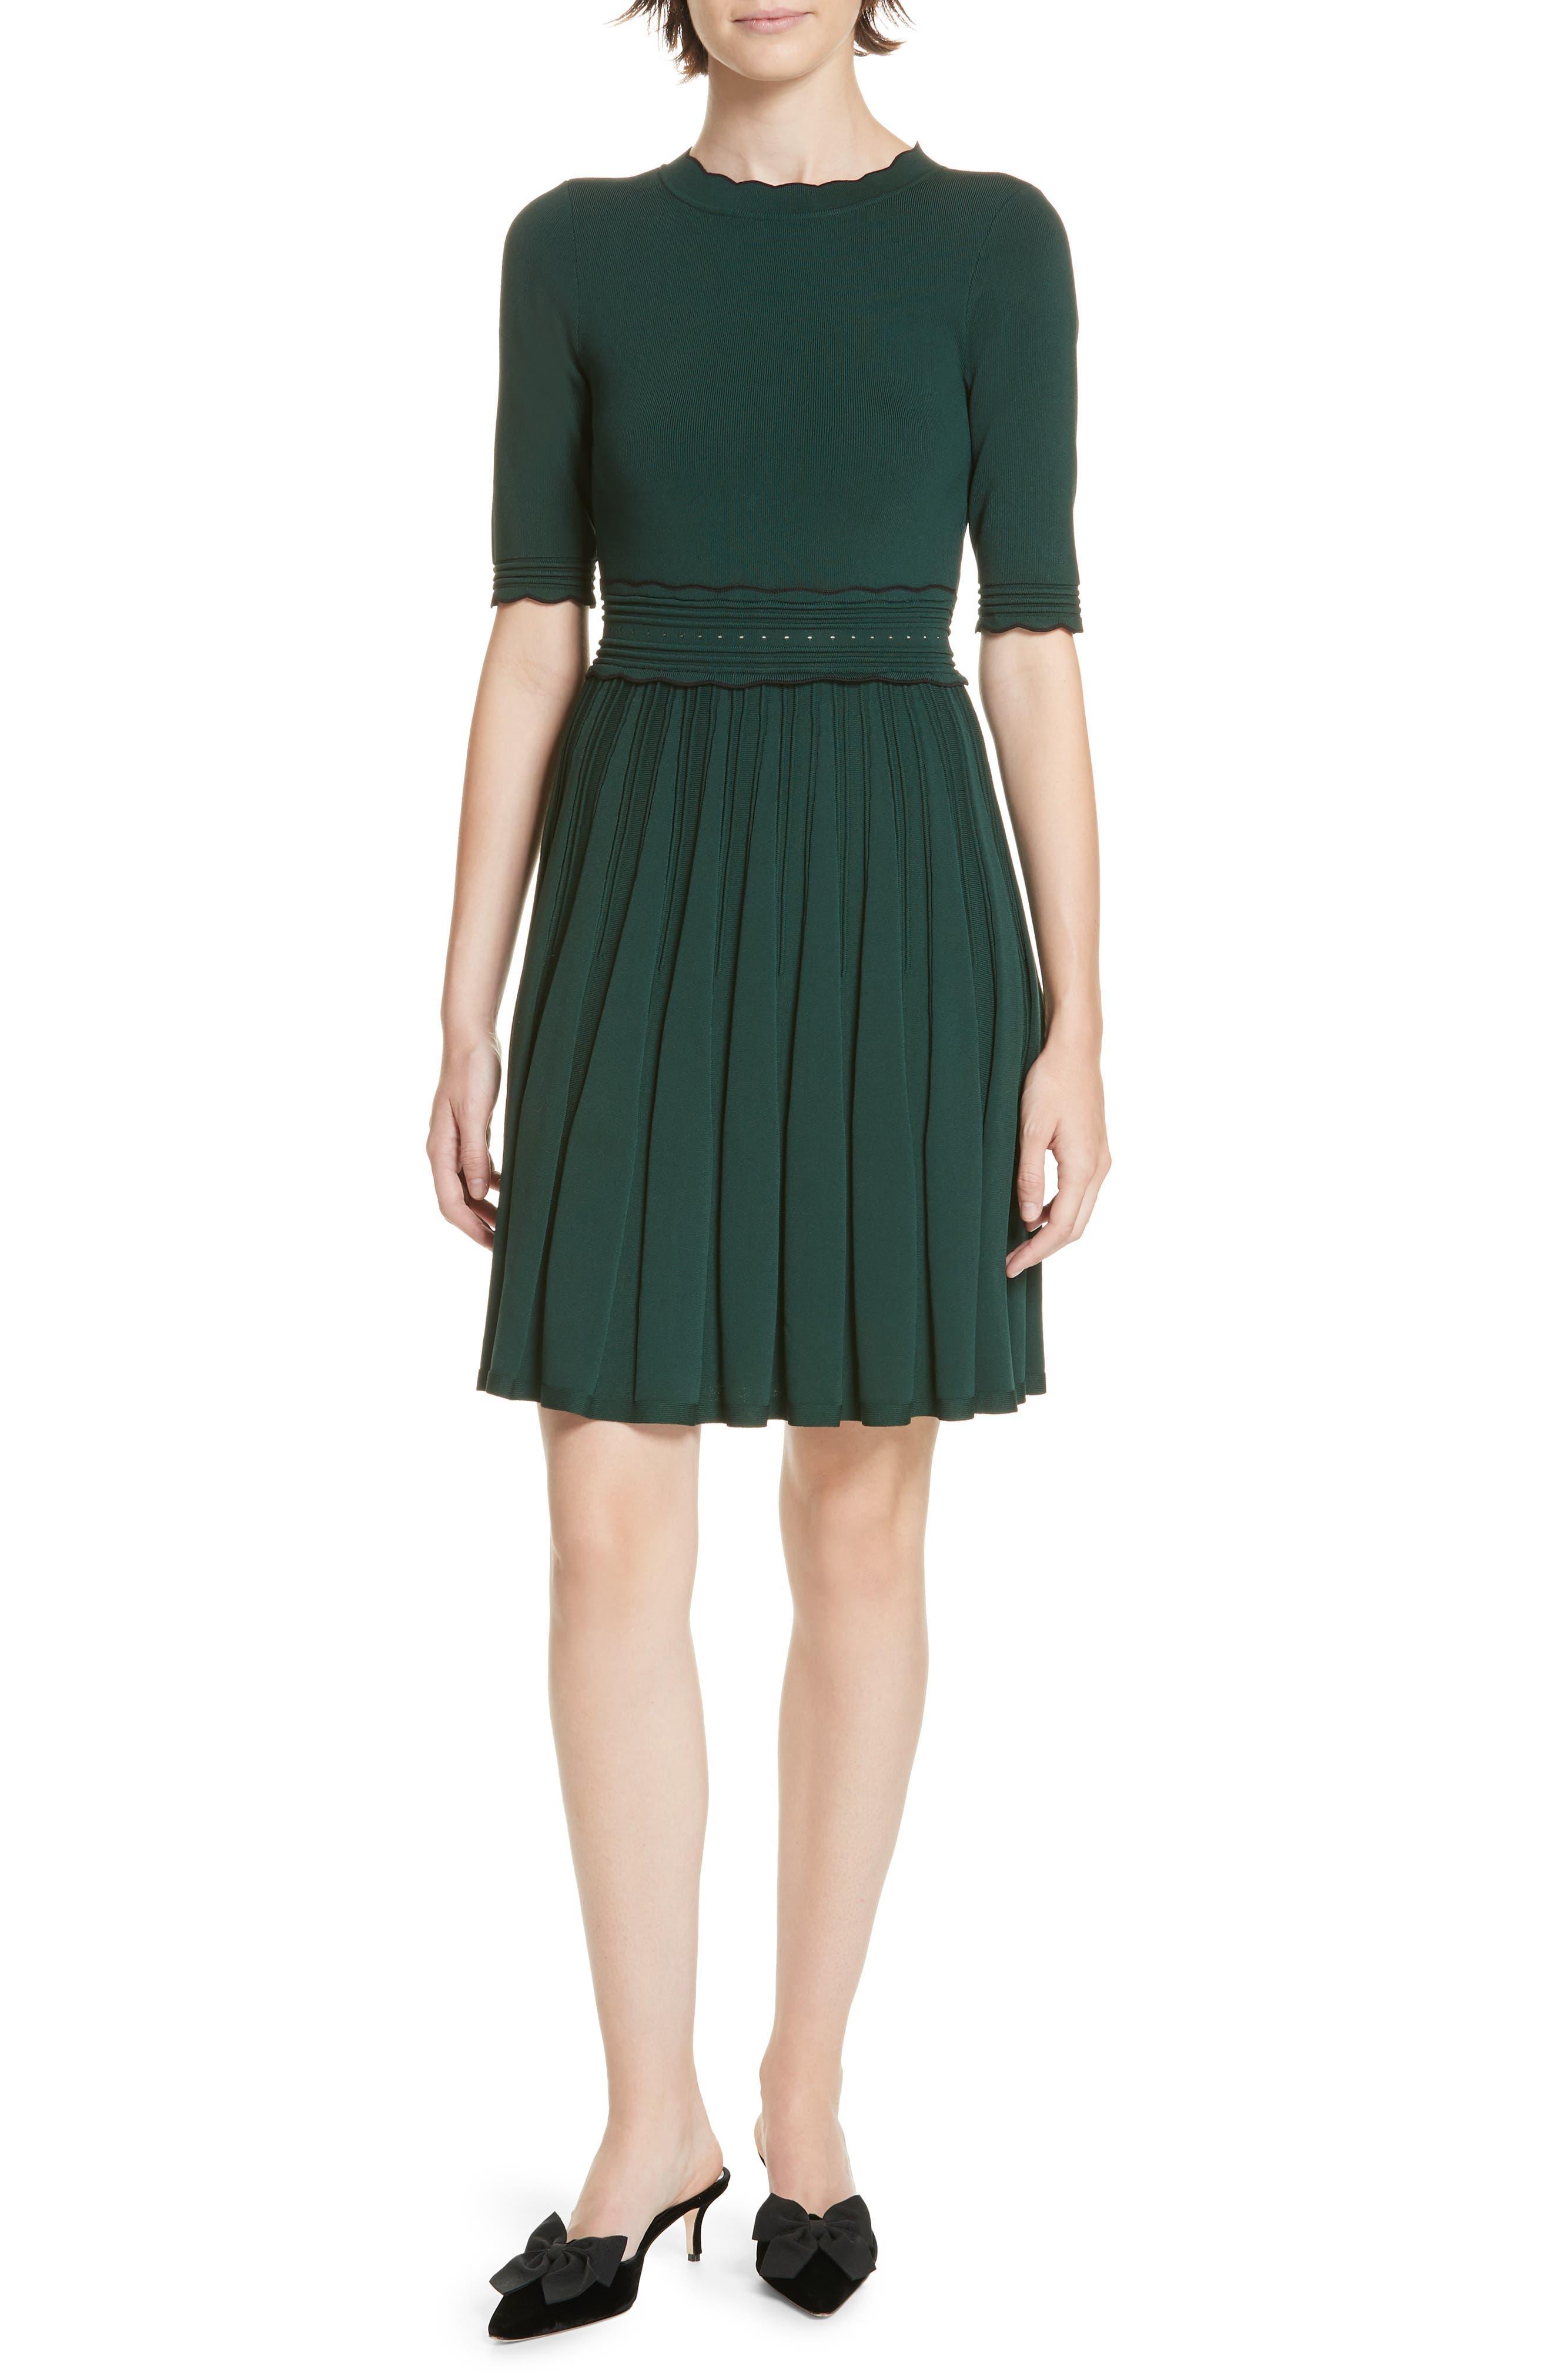 Dorlean Knit Dress,                             Main thumbnail 1, color,                             DARK GREEN